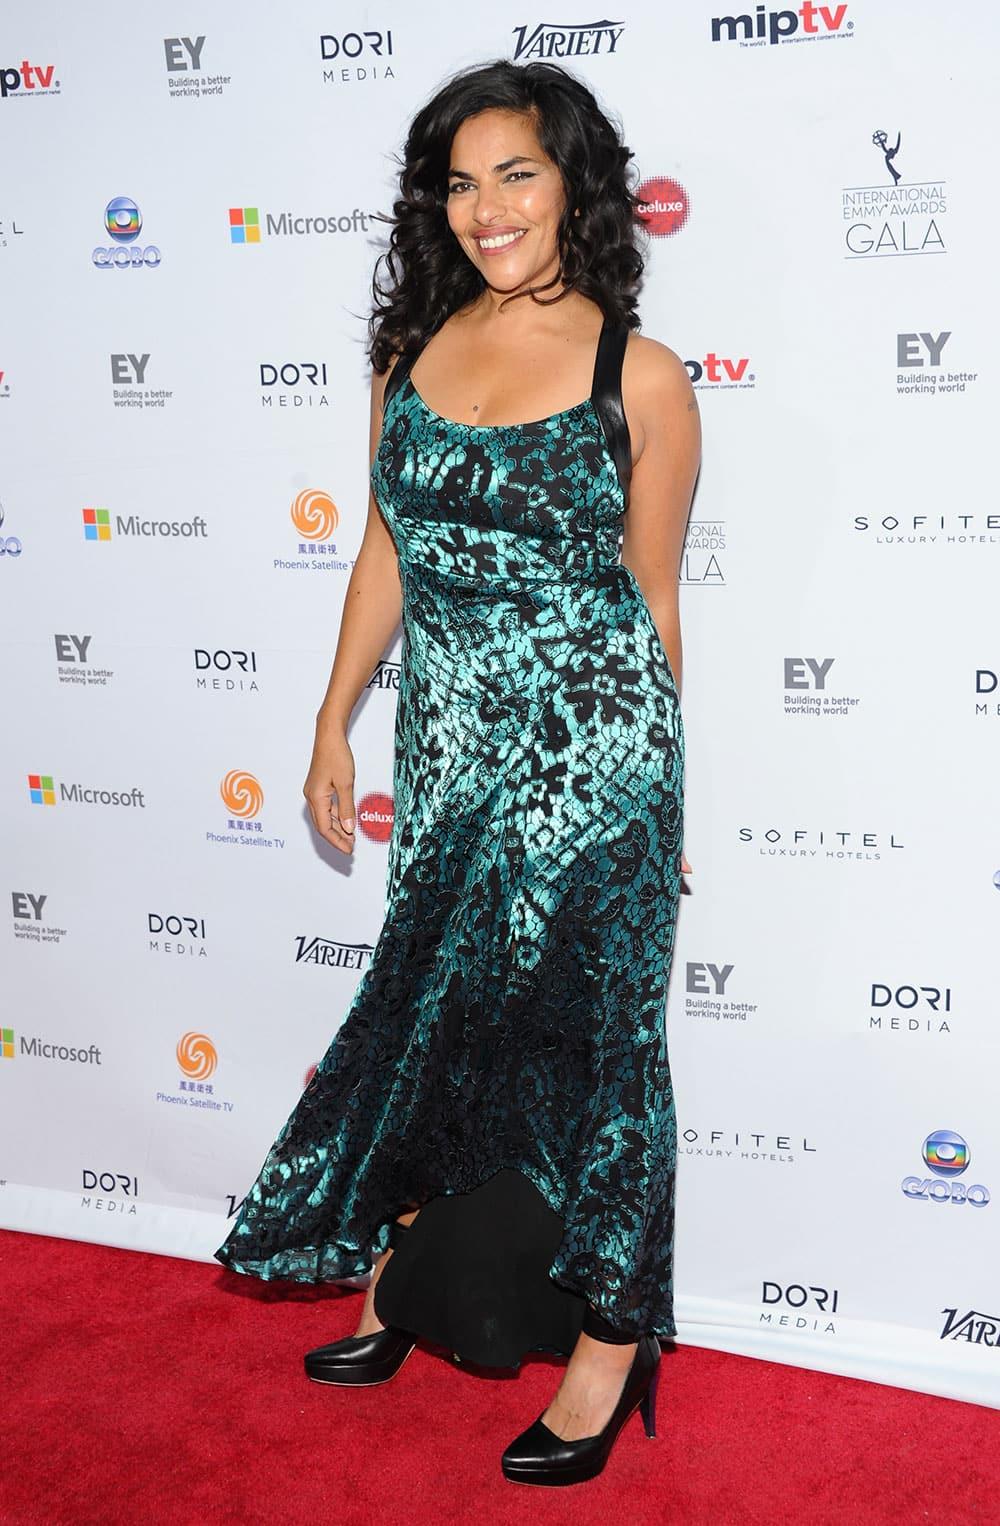 Actress Sarita Choudhury arrives at the 2013 International Emmy Awards Gala at the New York Hilton.